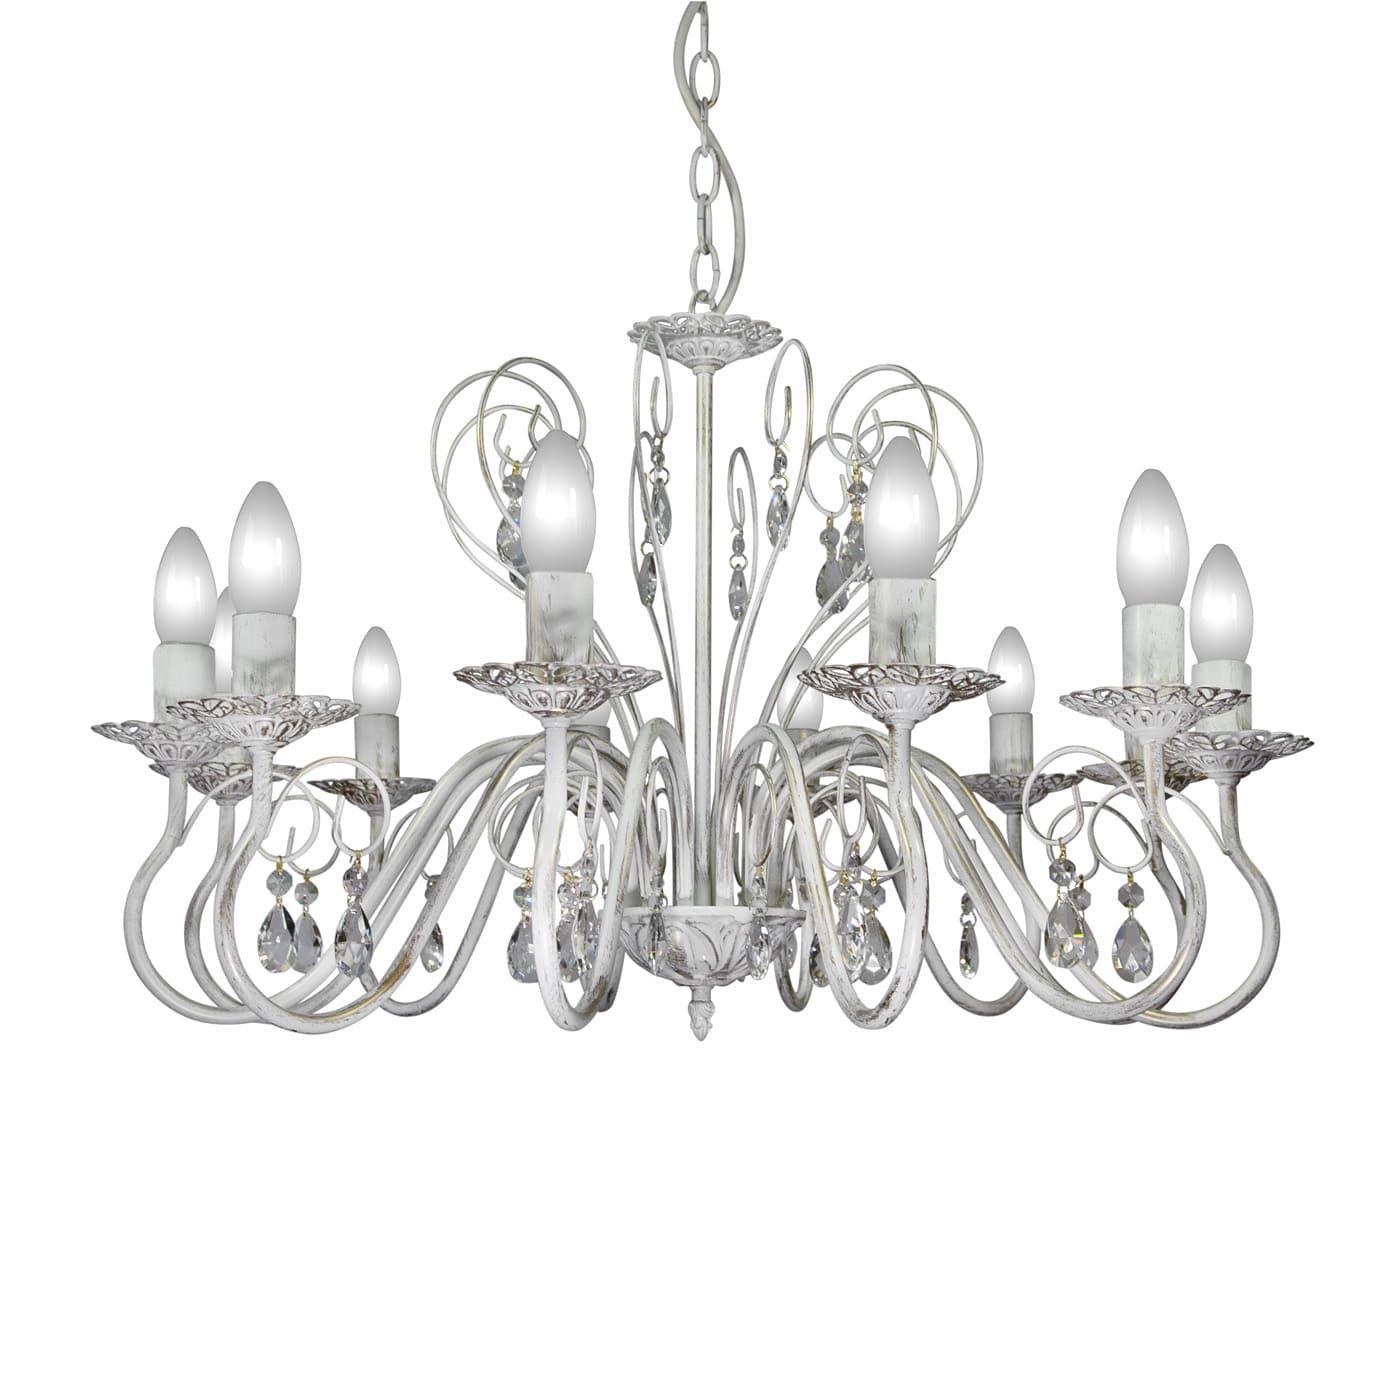 PETRASVET / Pendant chandelier S1163-12, 12xE14 max. 60W